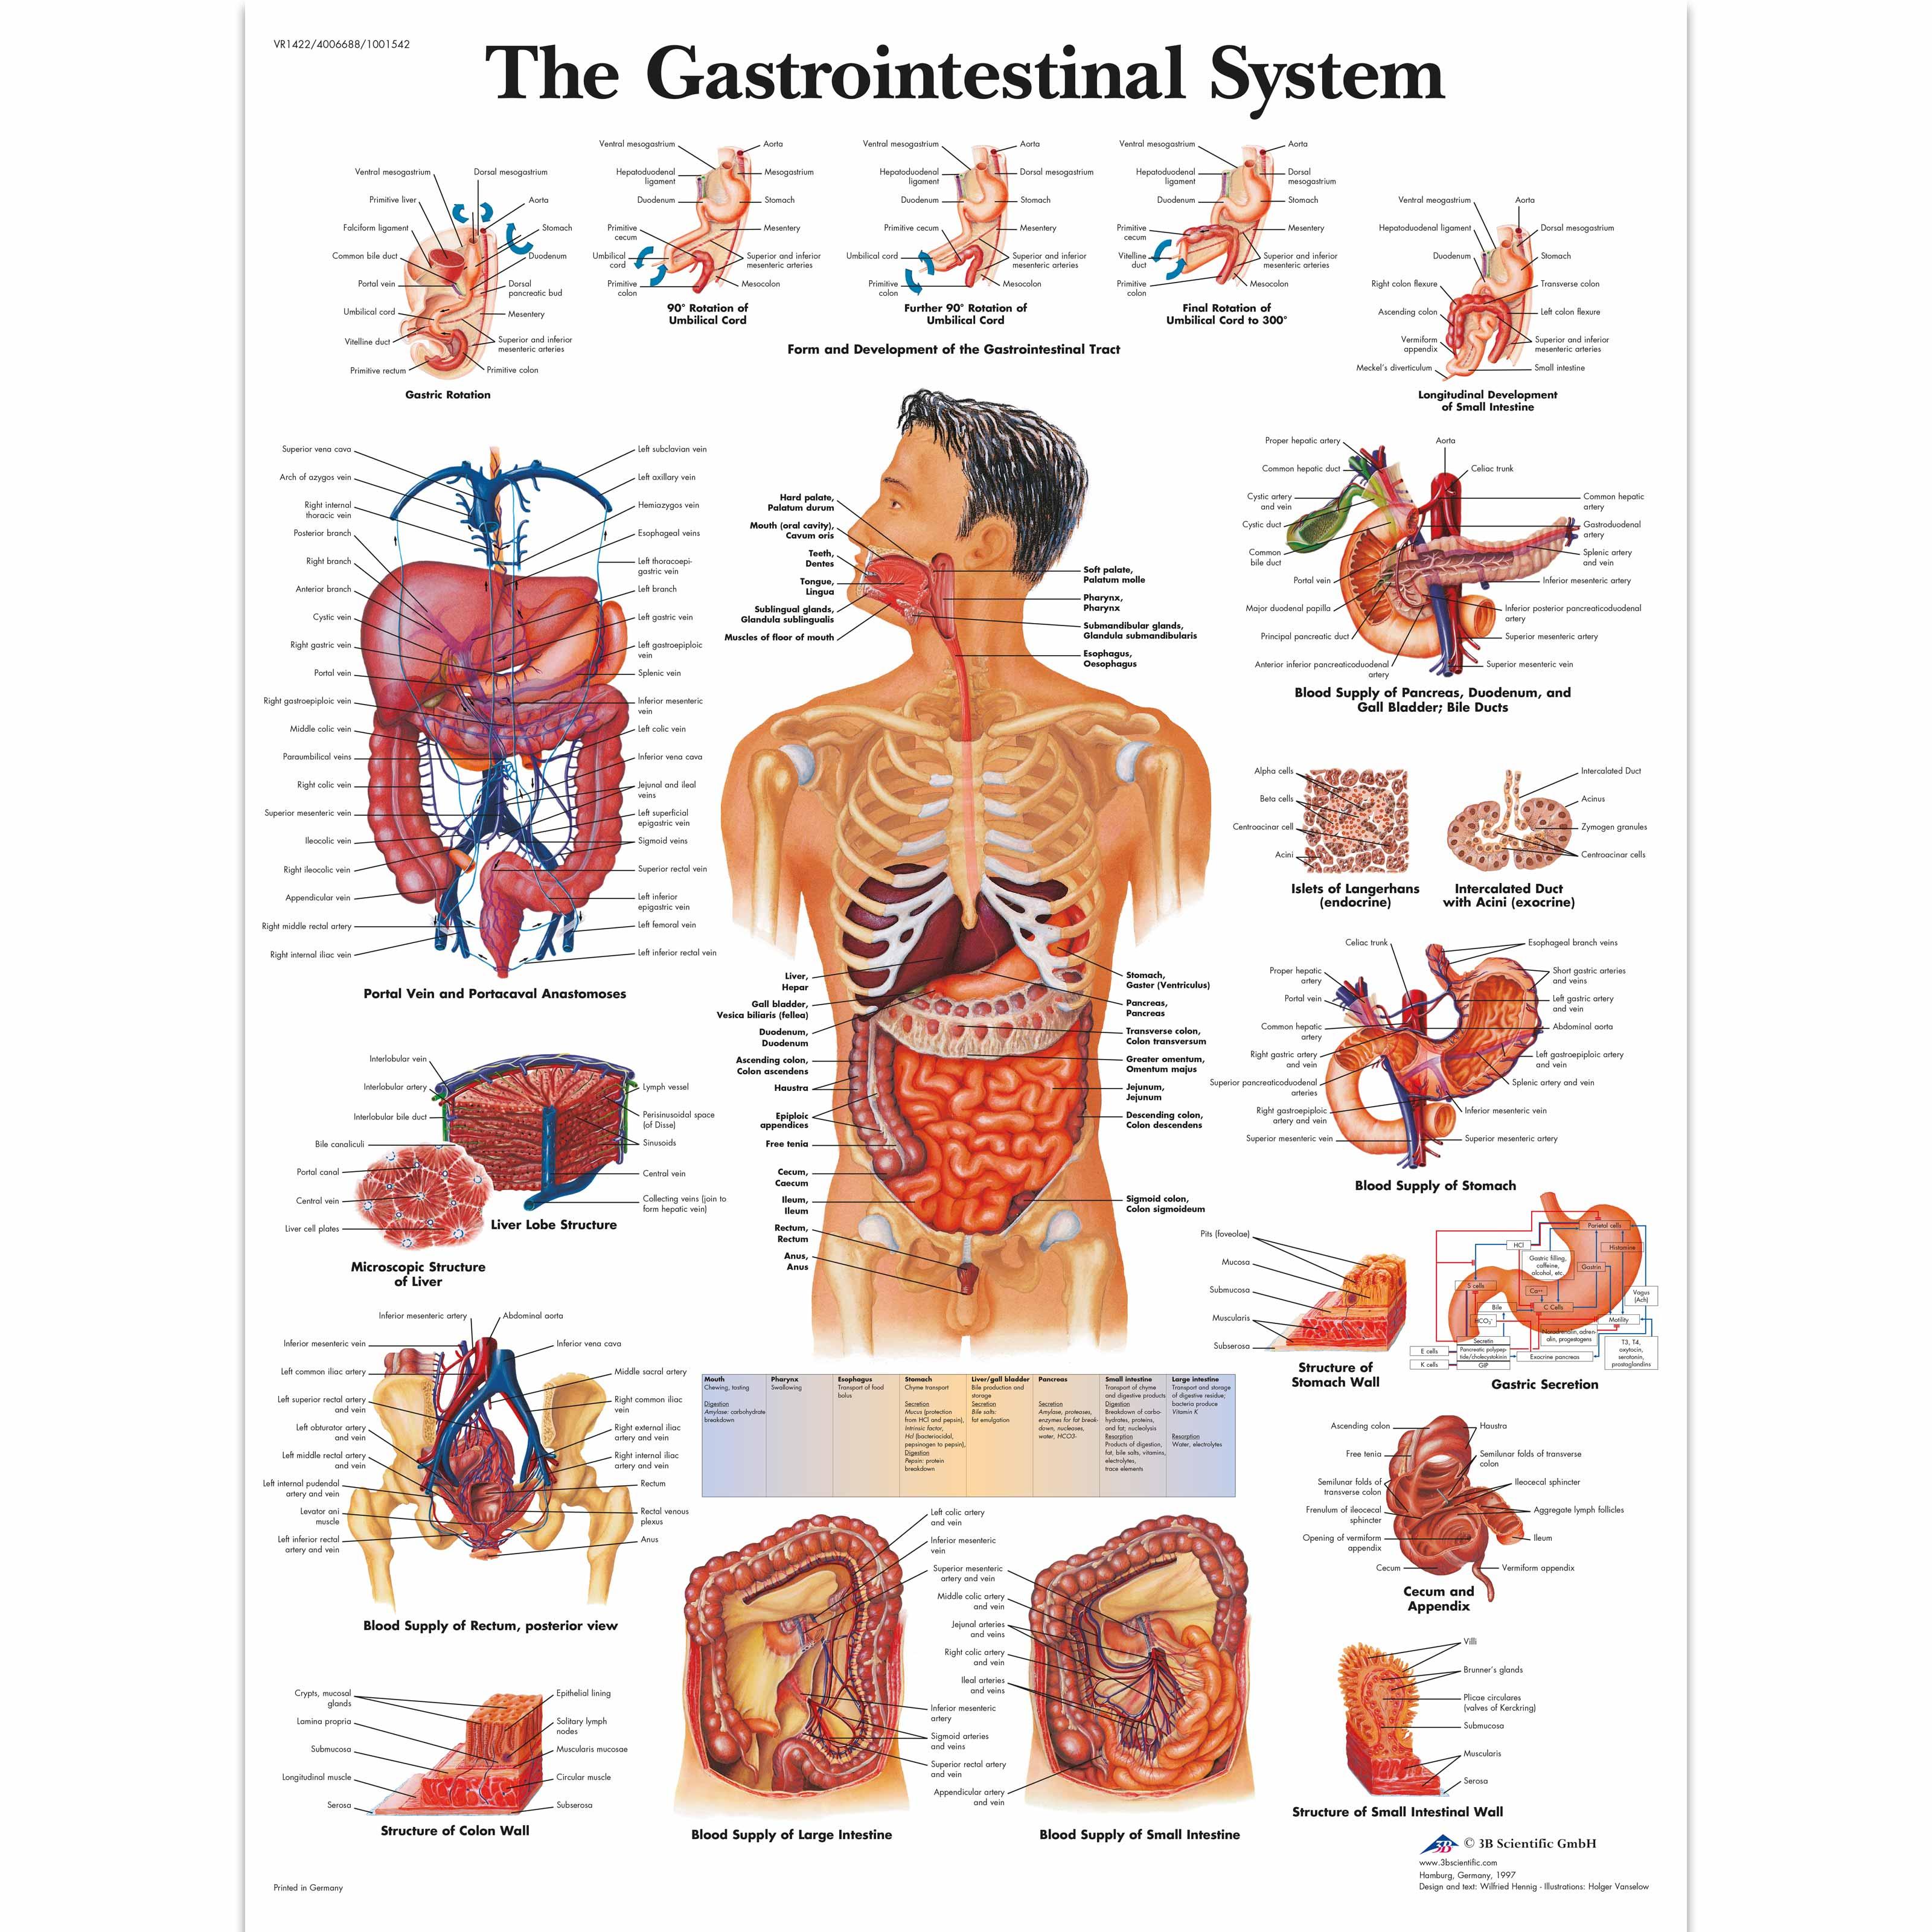 Human Organs Anatomy Skull Heart Gastrointestinal System Retro